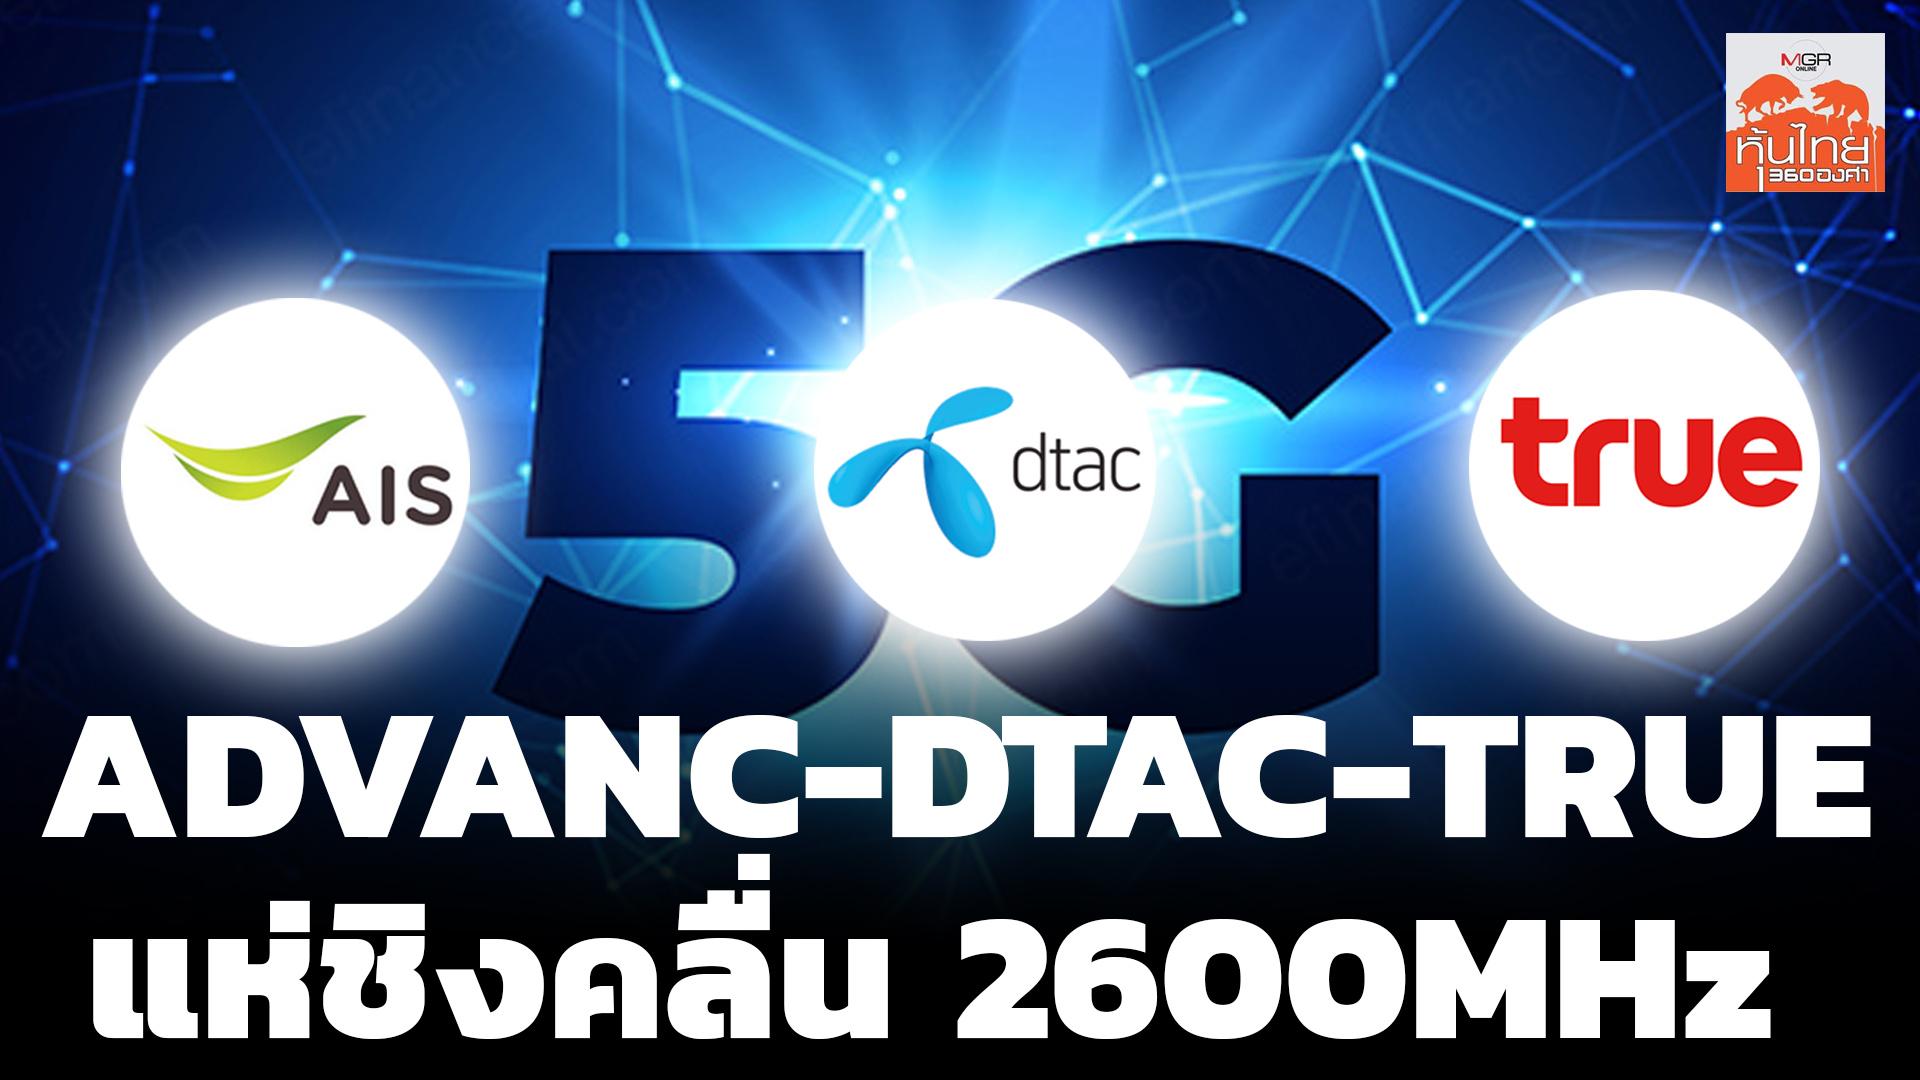 ADVANC-DATC-TRUE แห่ชิงคลื่น 2600MHz